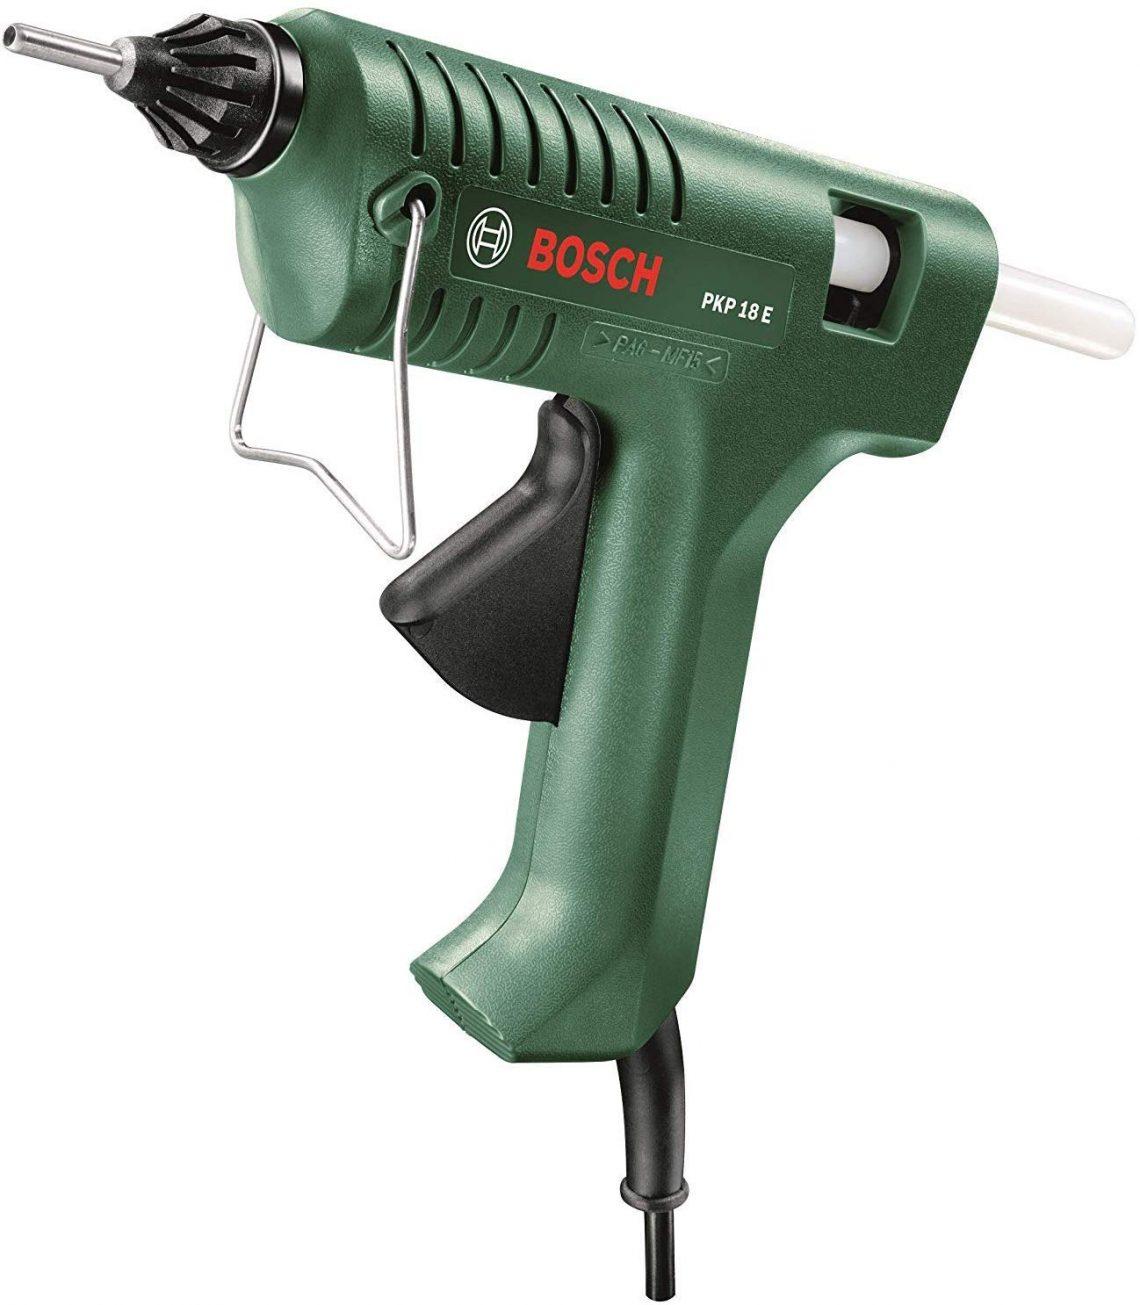 Bosch Home and Garden 0603264503 Pistolet à colle PKP 18 E, Vert